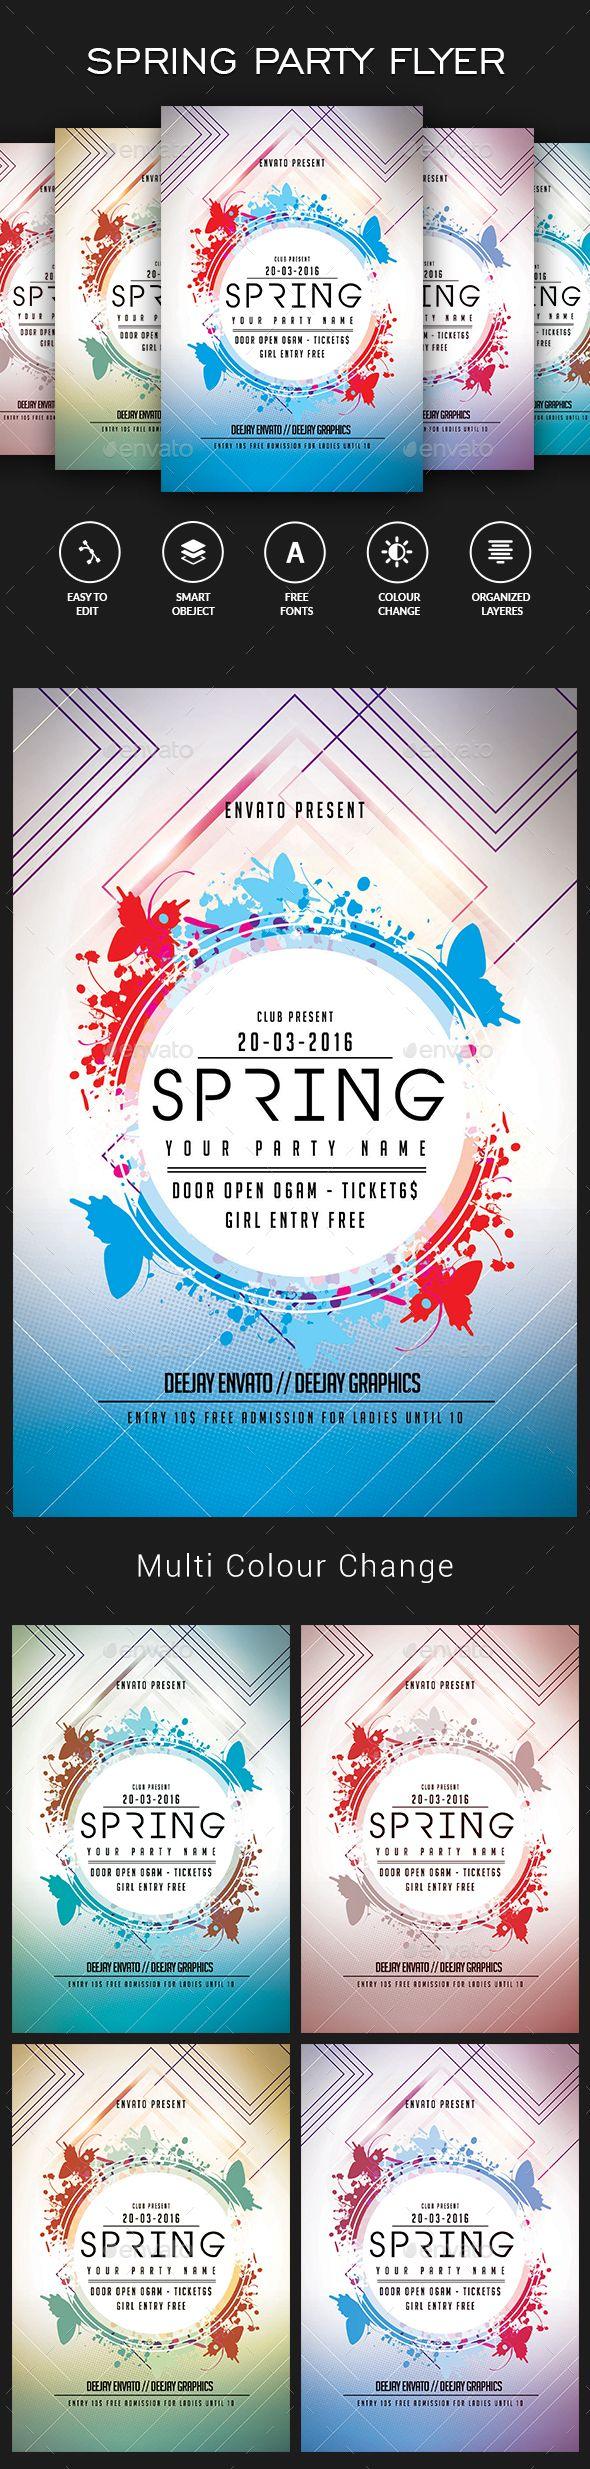 Spring Flyer Template PSD